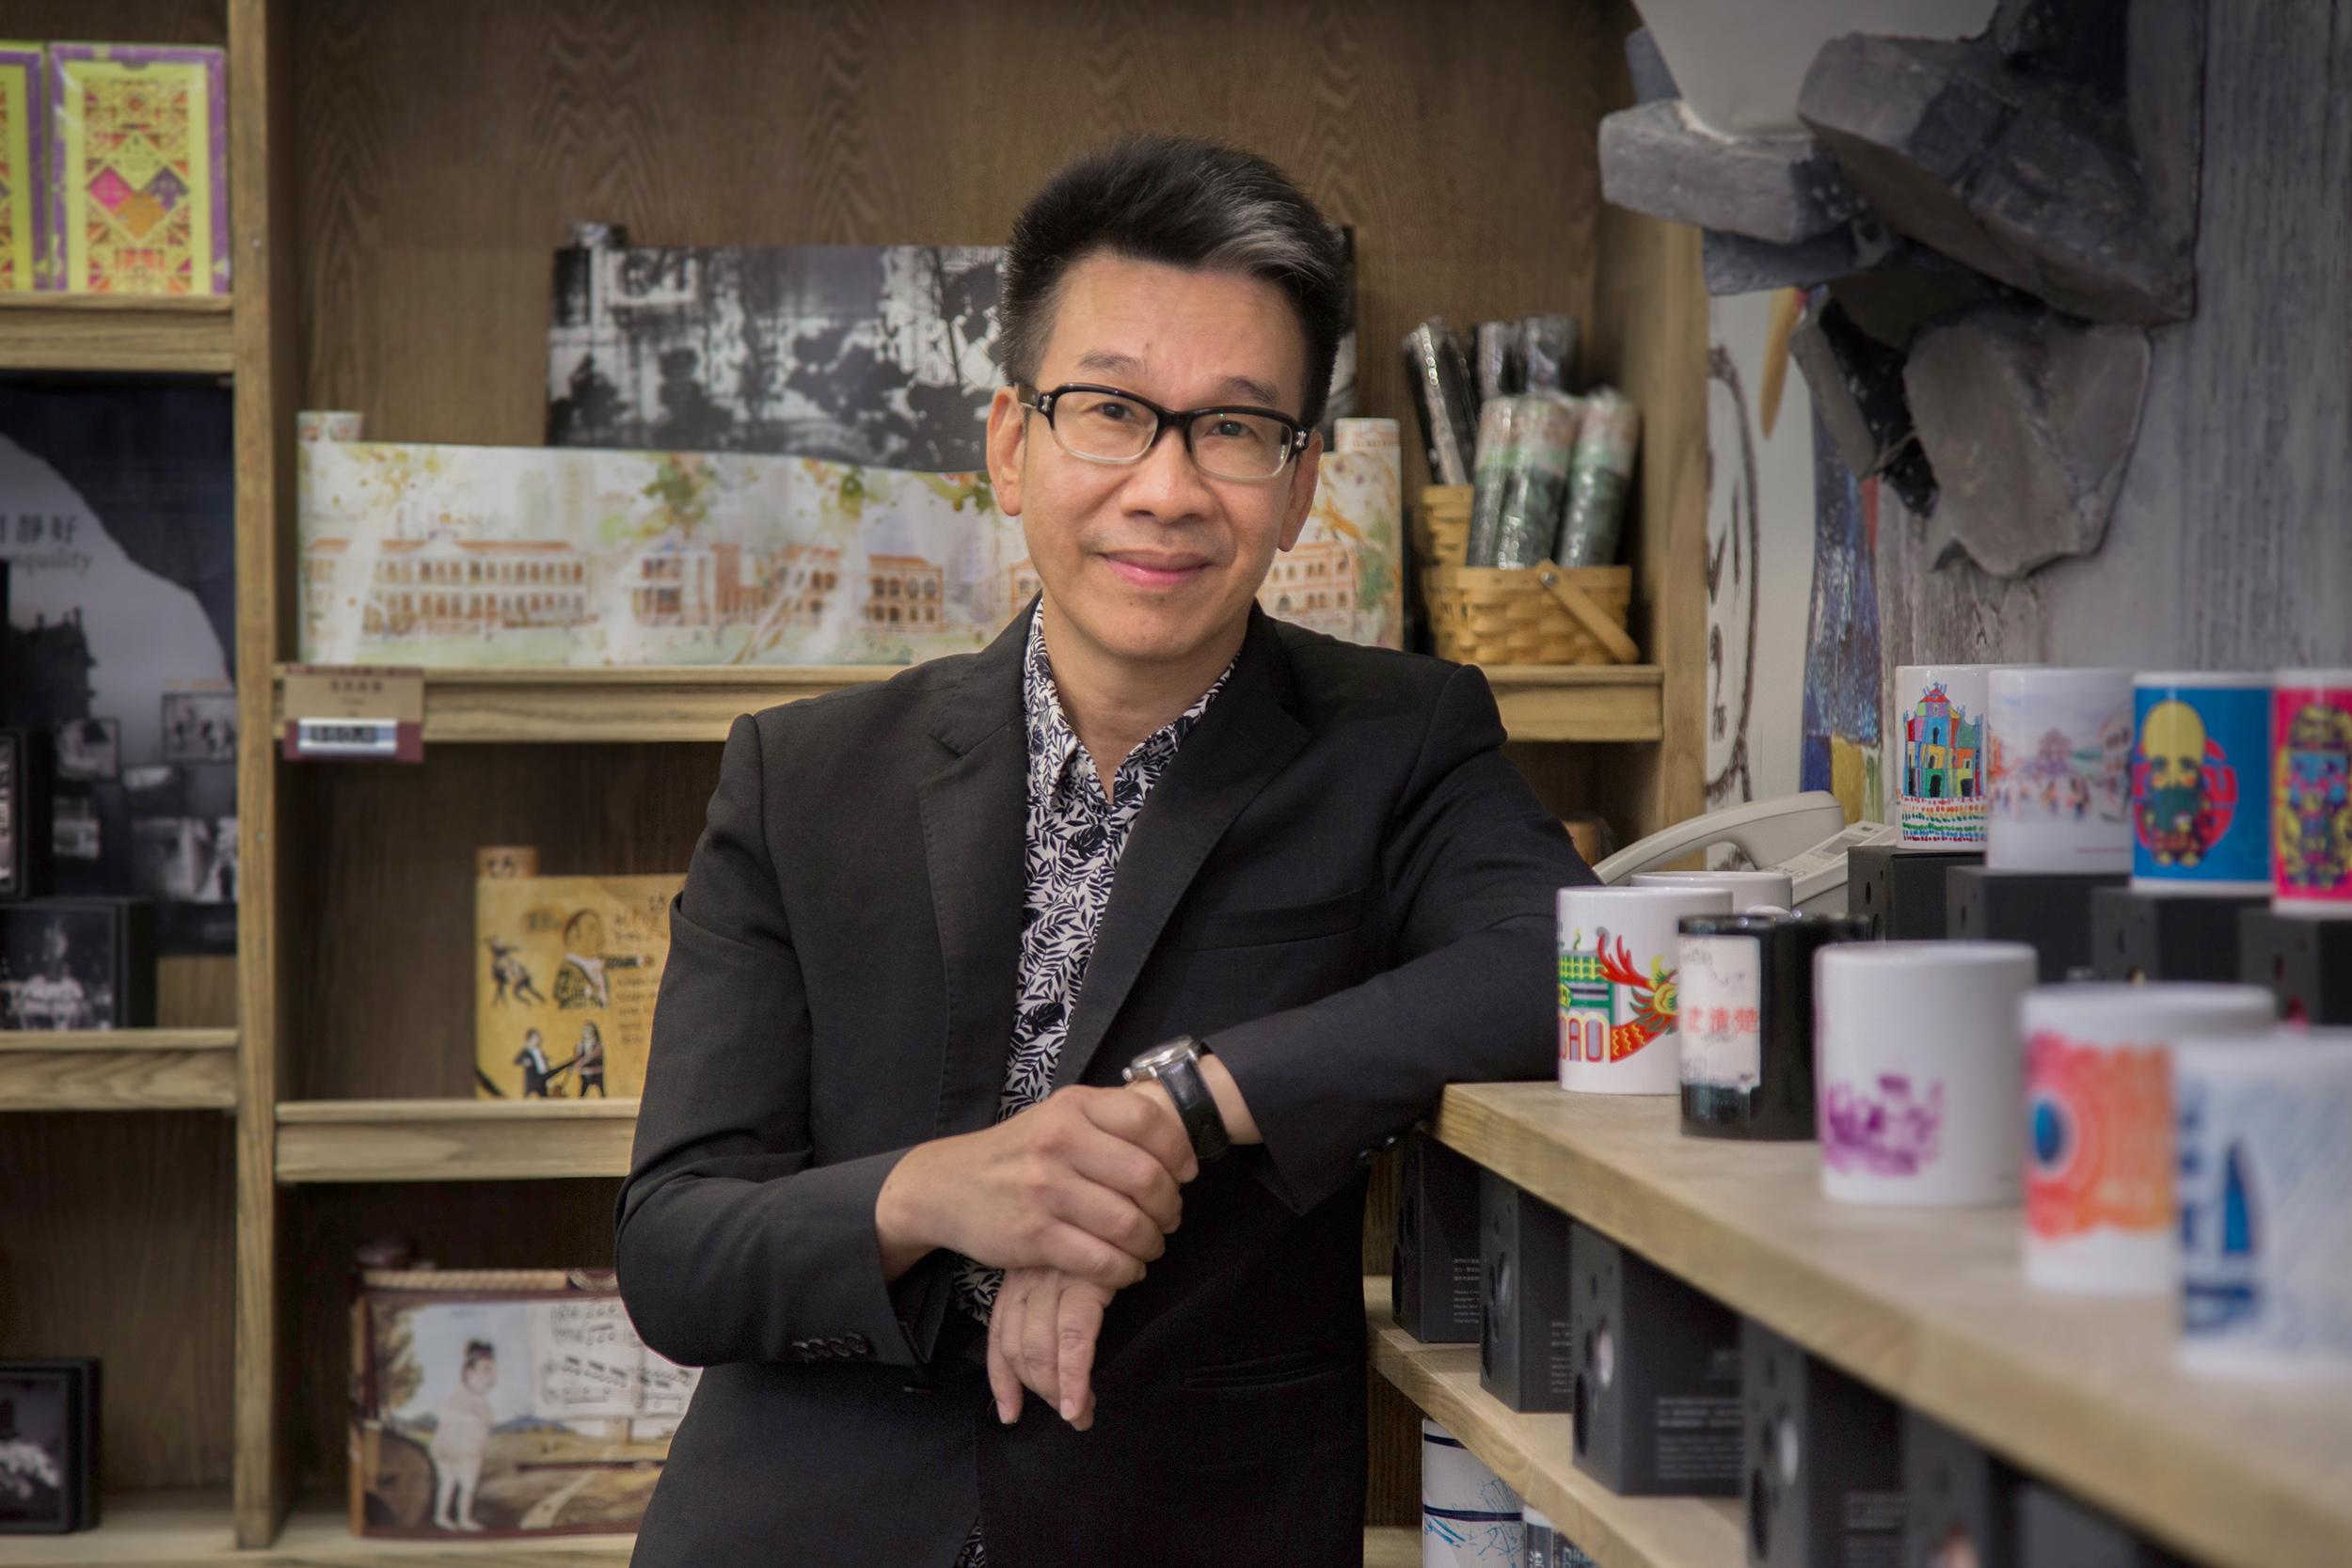 Wilson Lam